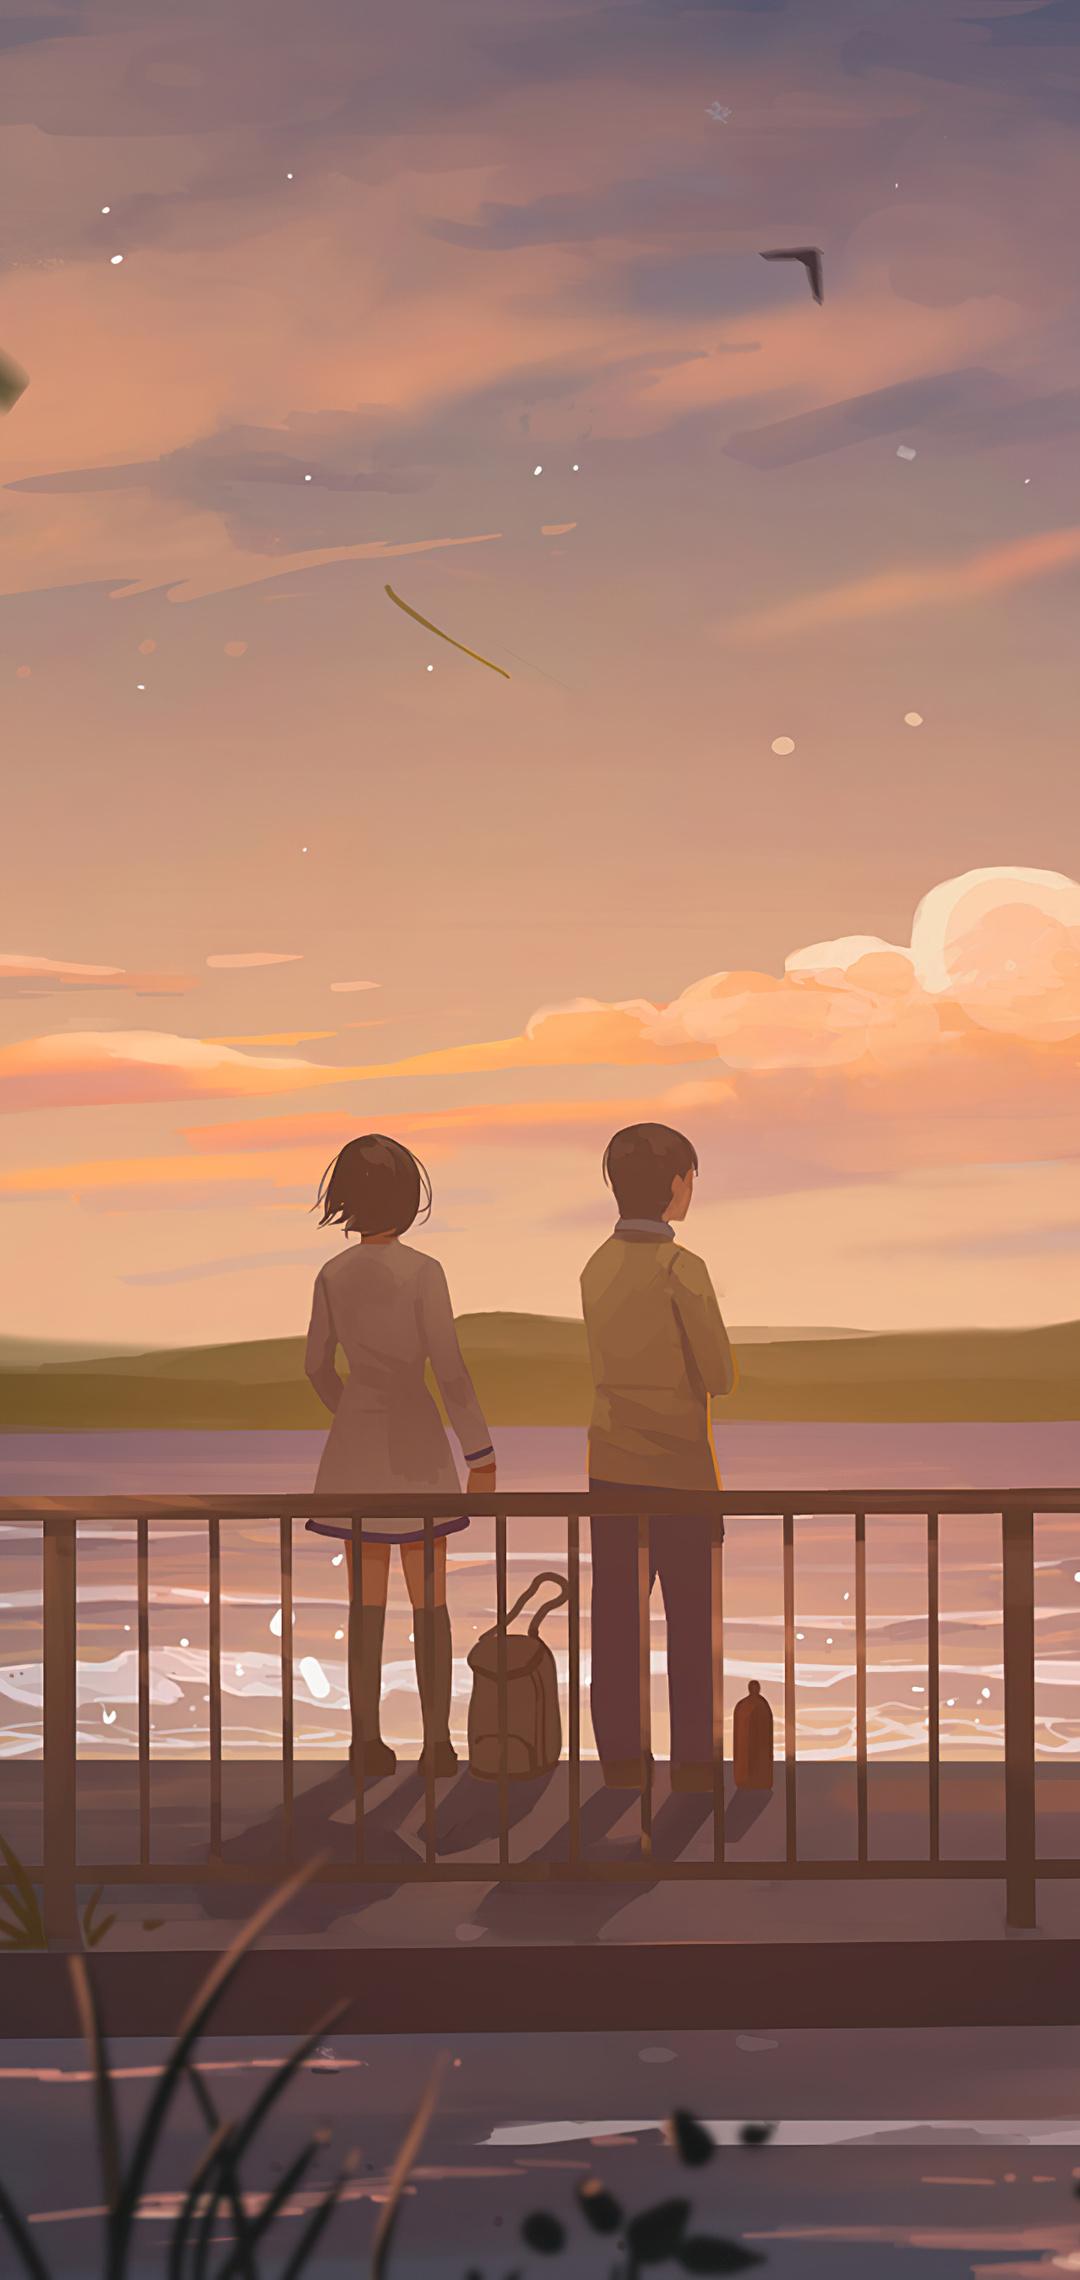 1080x2280 Anime Couple Lets Talk 4k One Plus 6,Huawei p20 ...